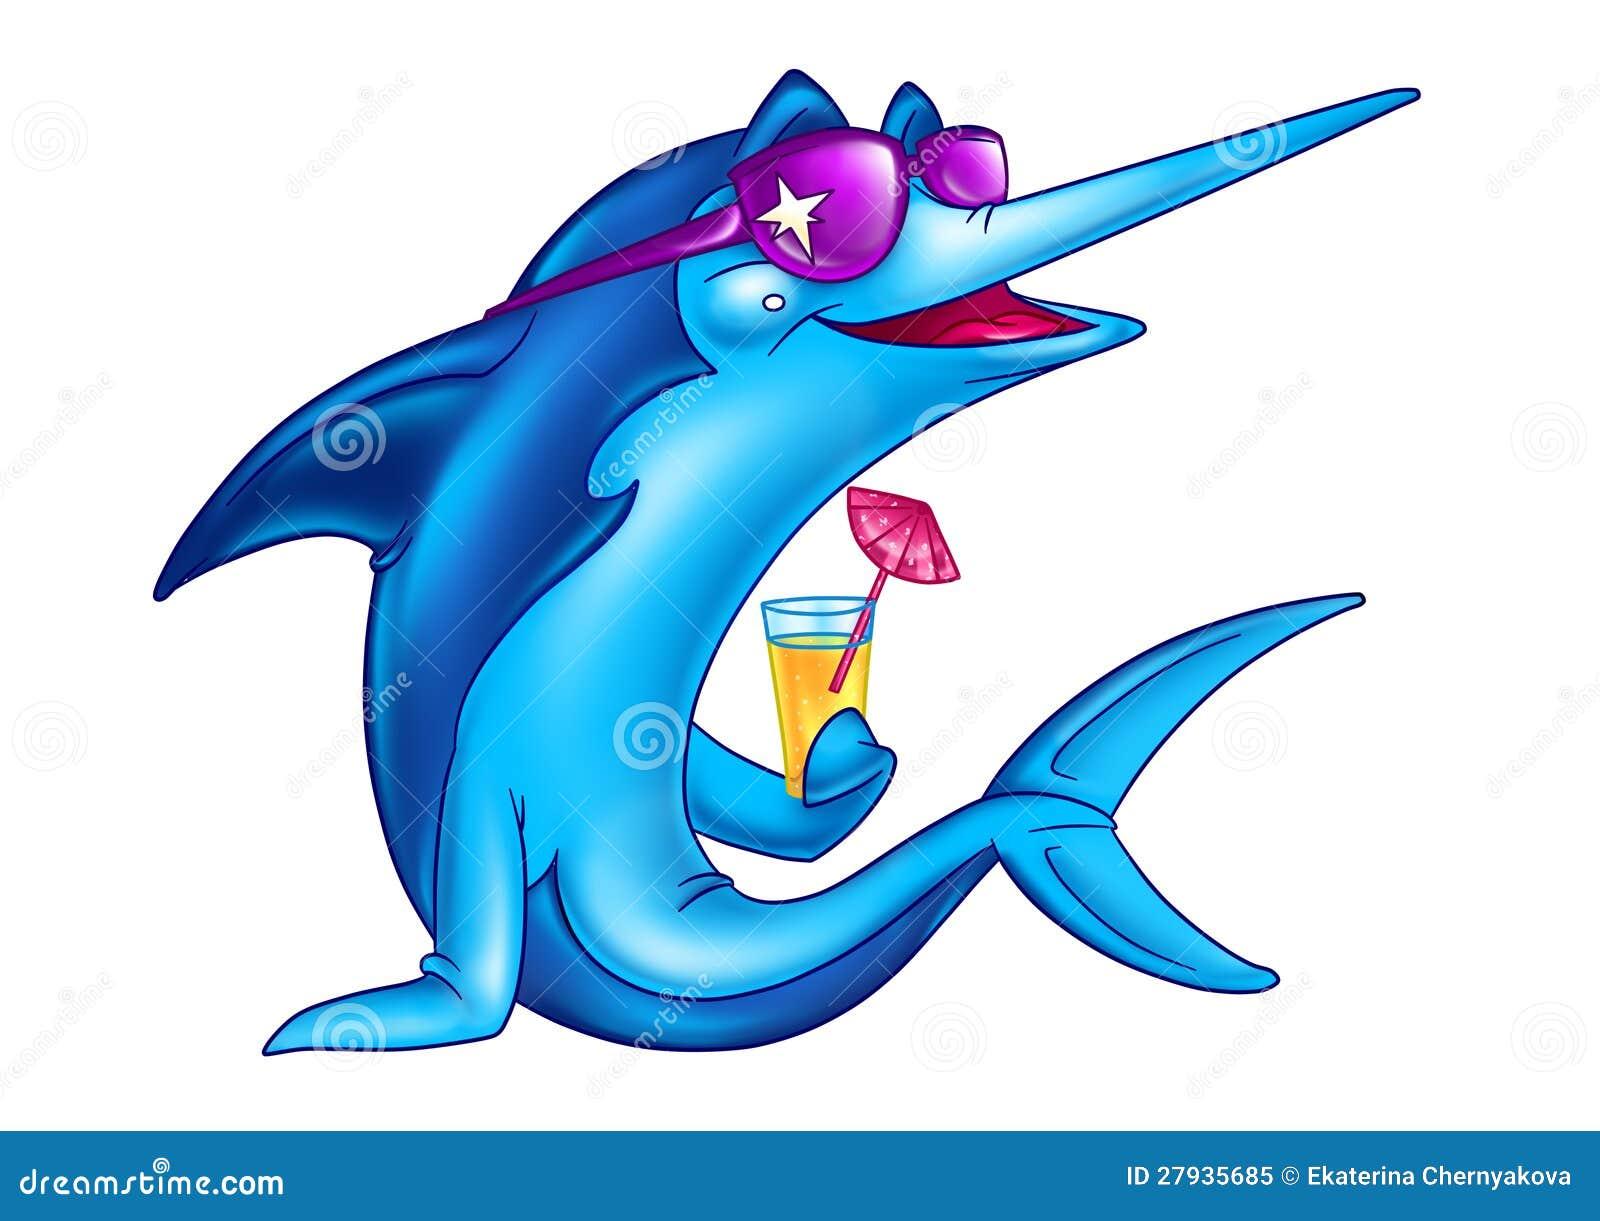 Fish On Vacation Cartoon Royalty Free Stock Photo Image 27935685